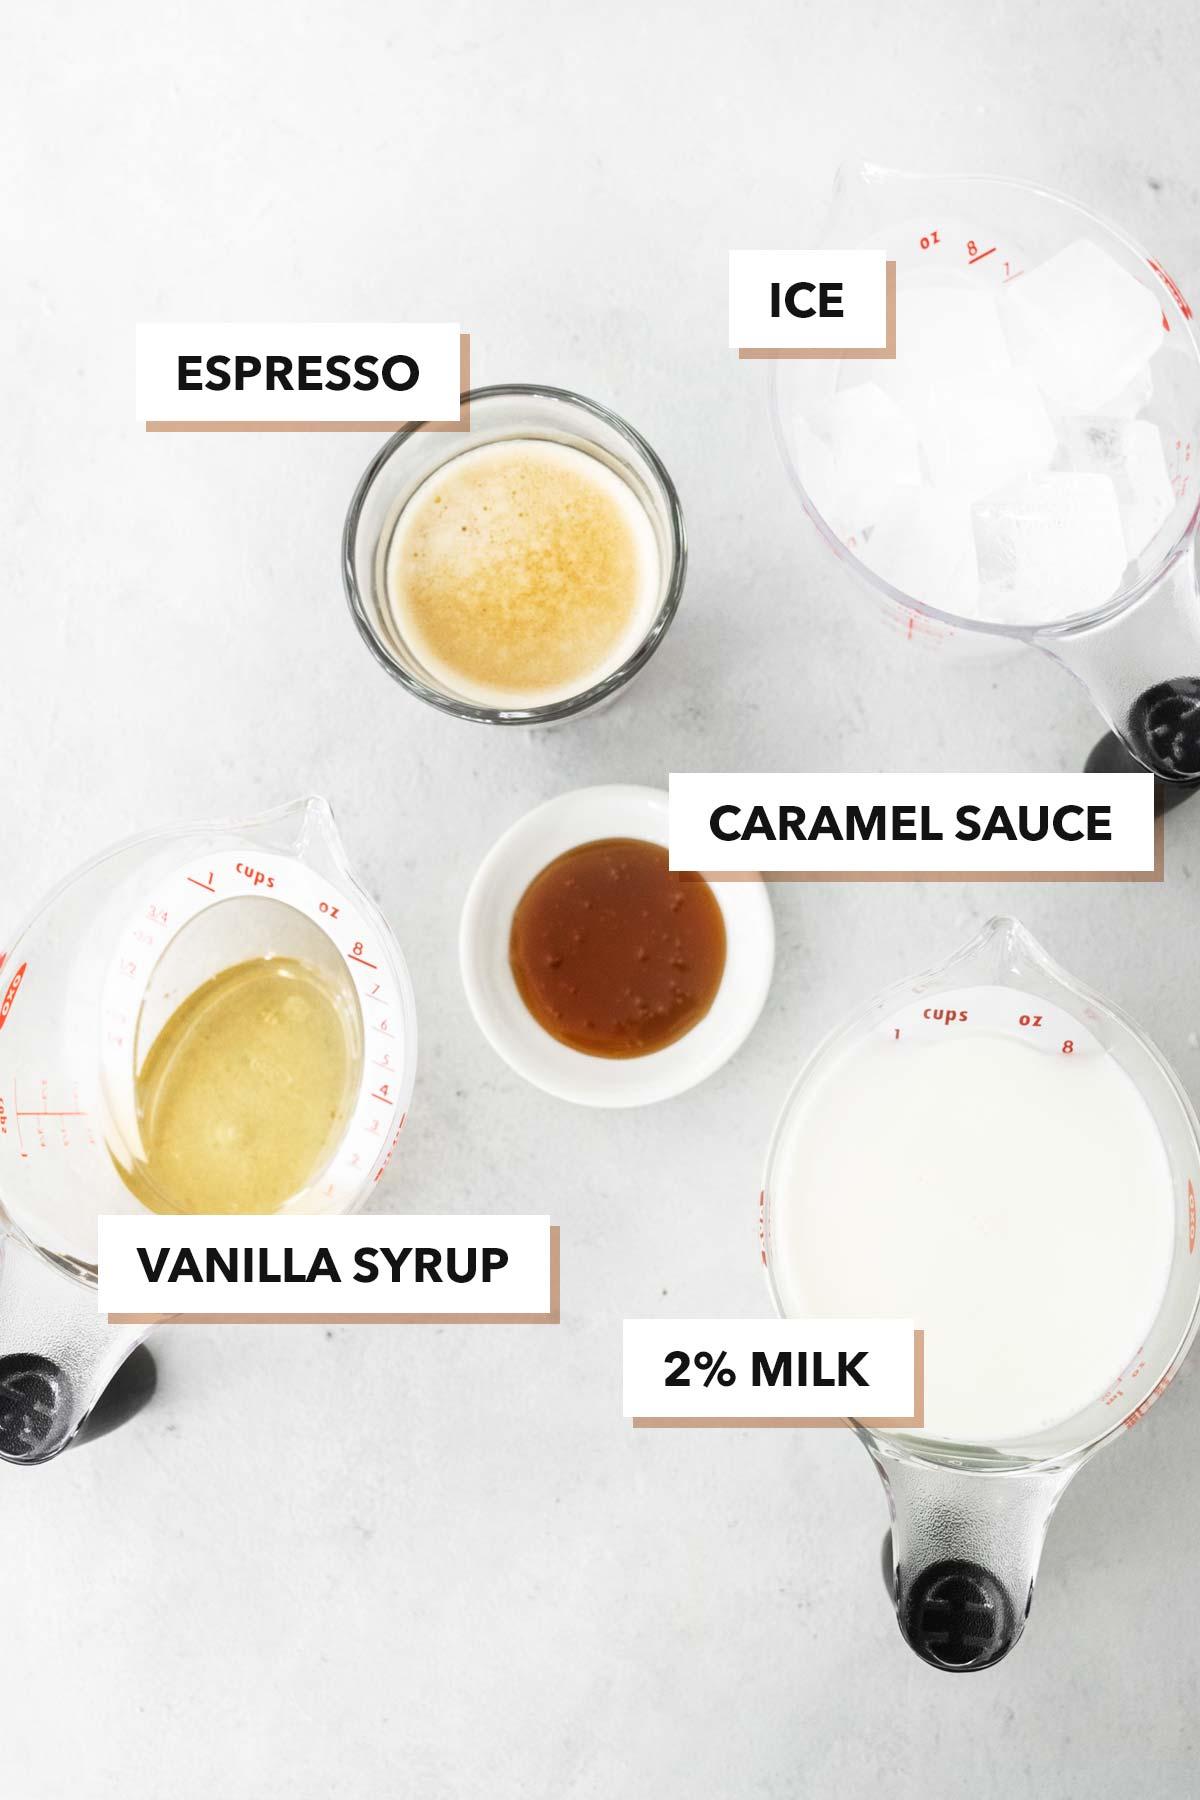 Starbucks Iced Caramel Macchiato copycat recipe ingredients.